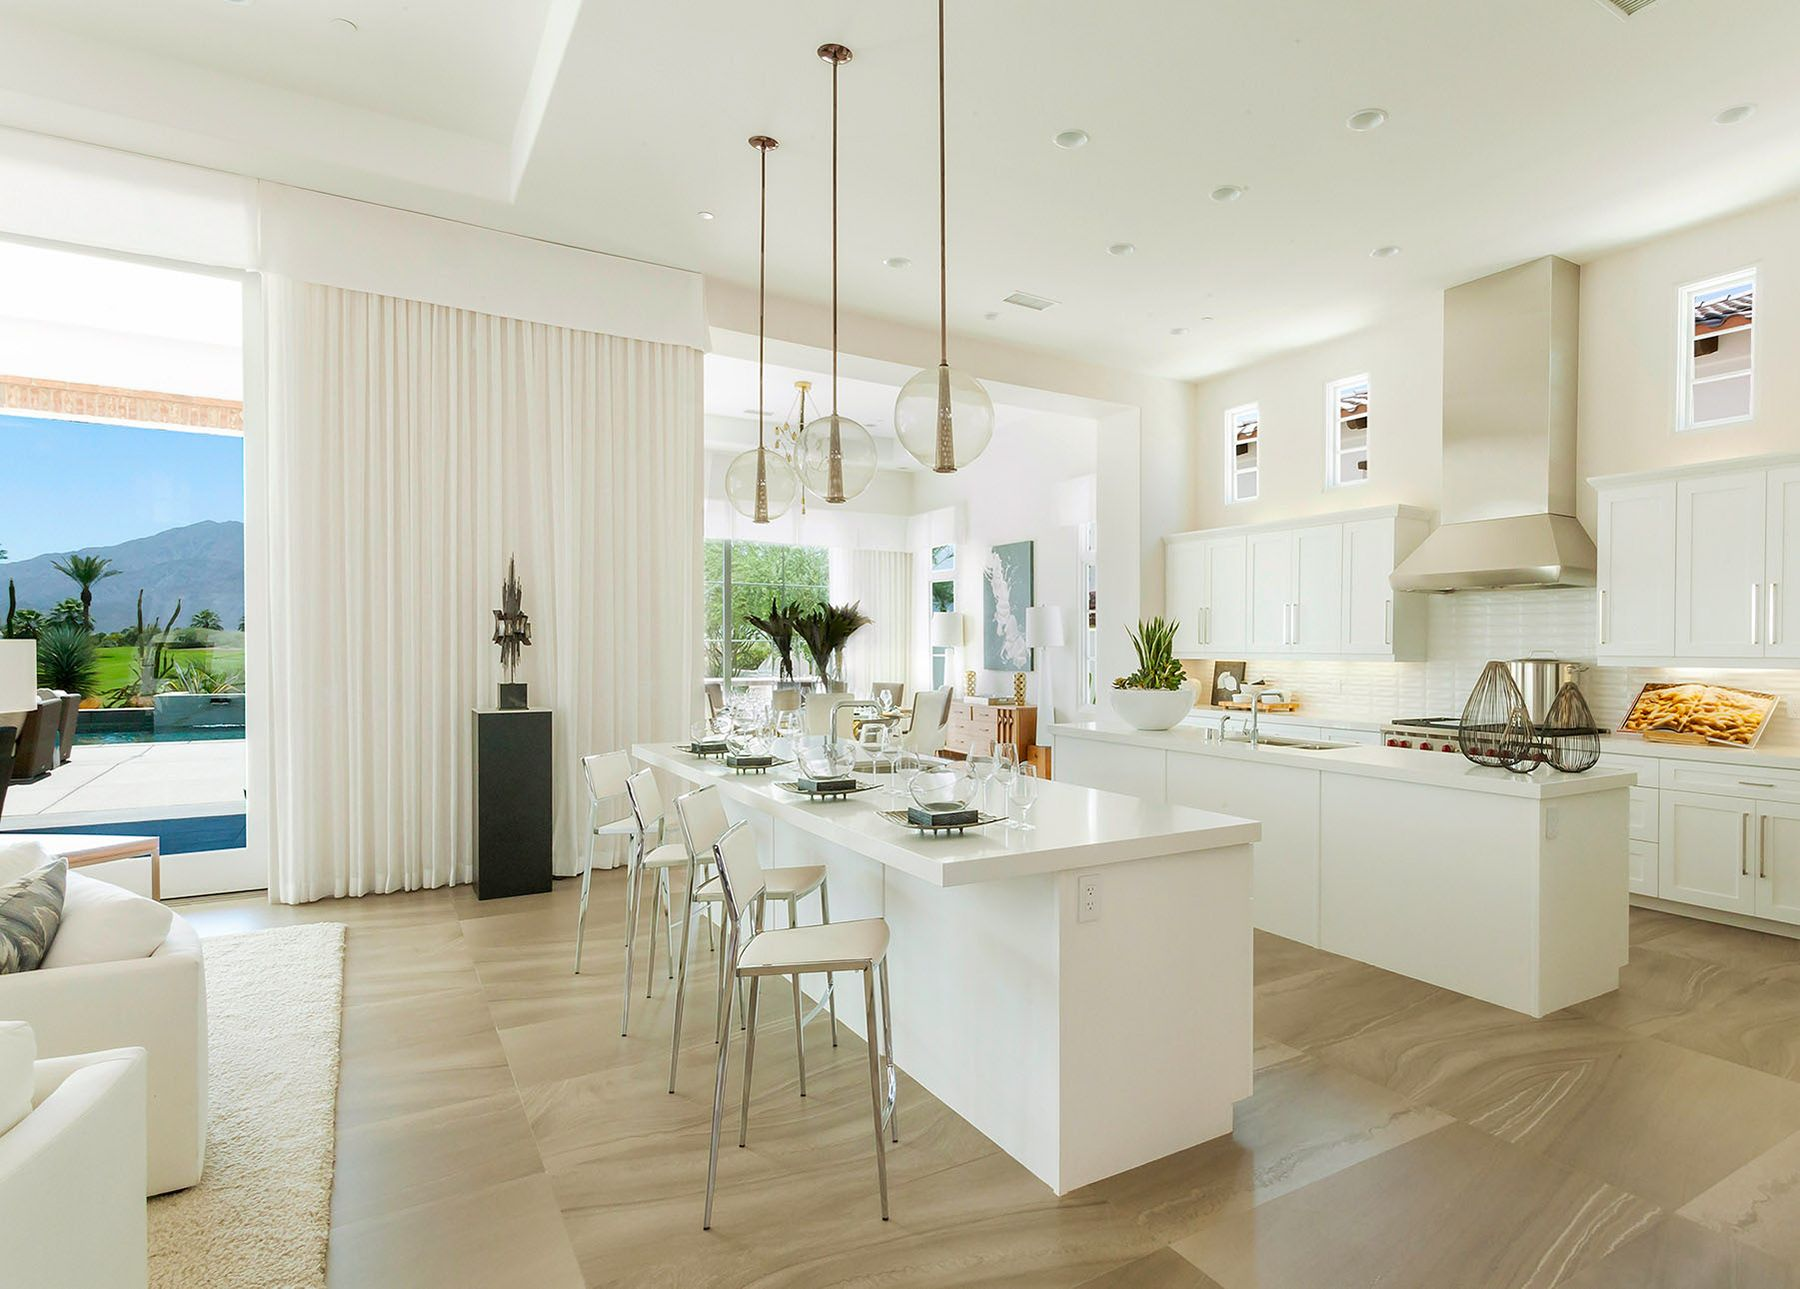 Kitchens & Dining 2.jpg